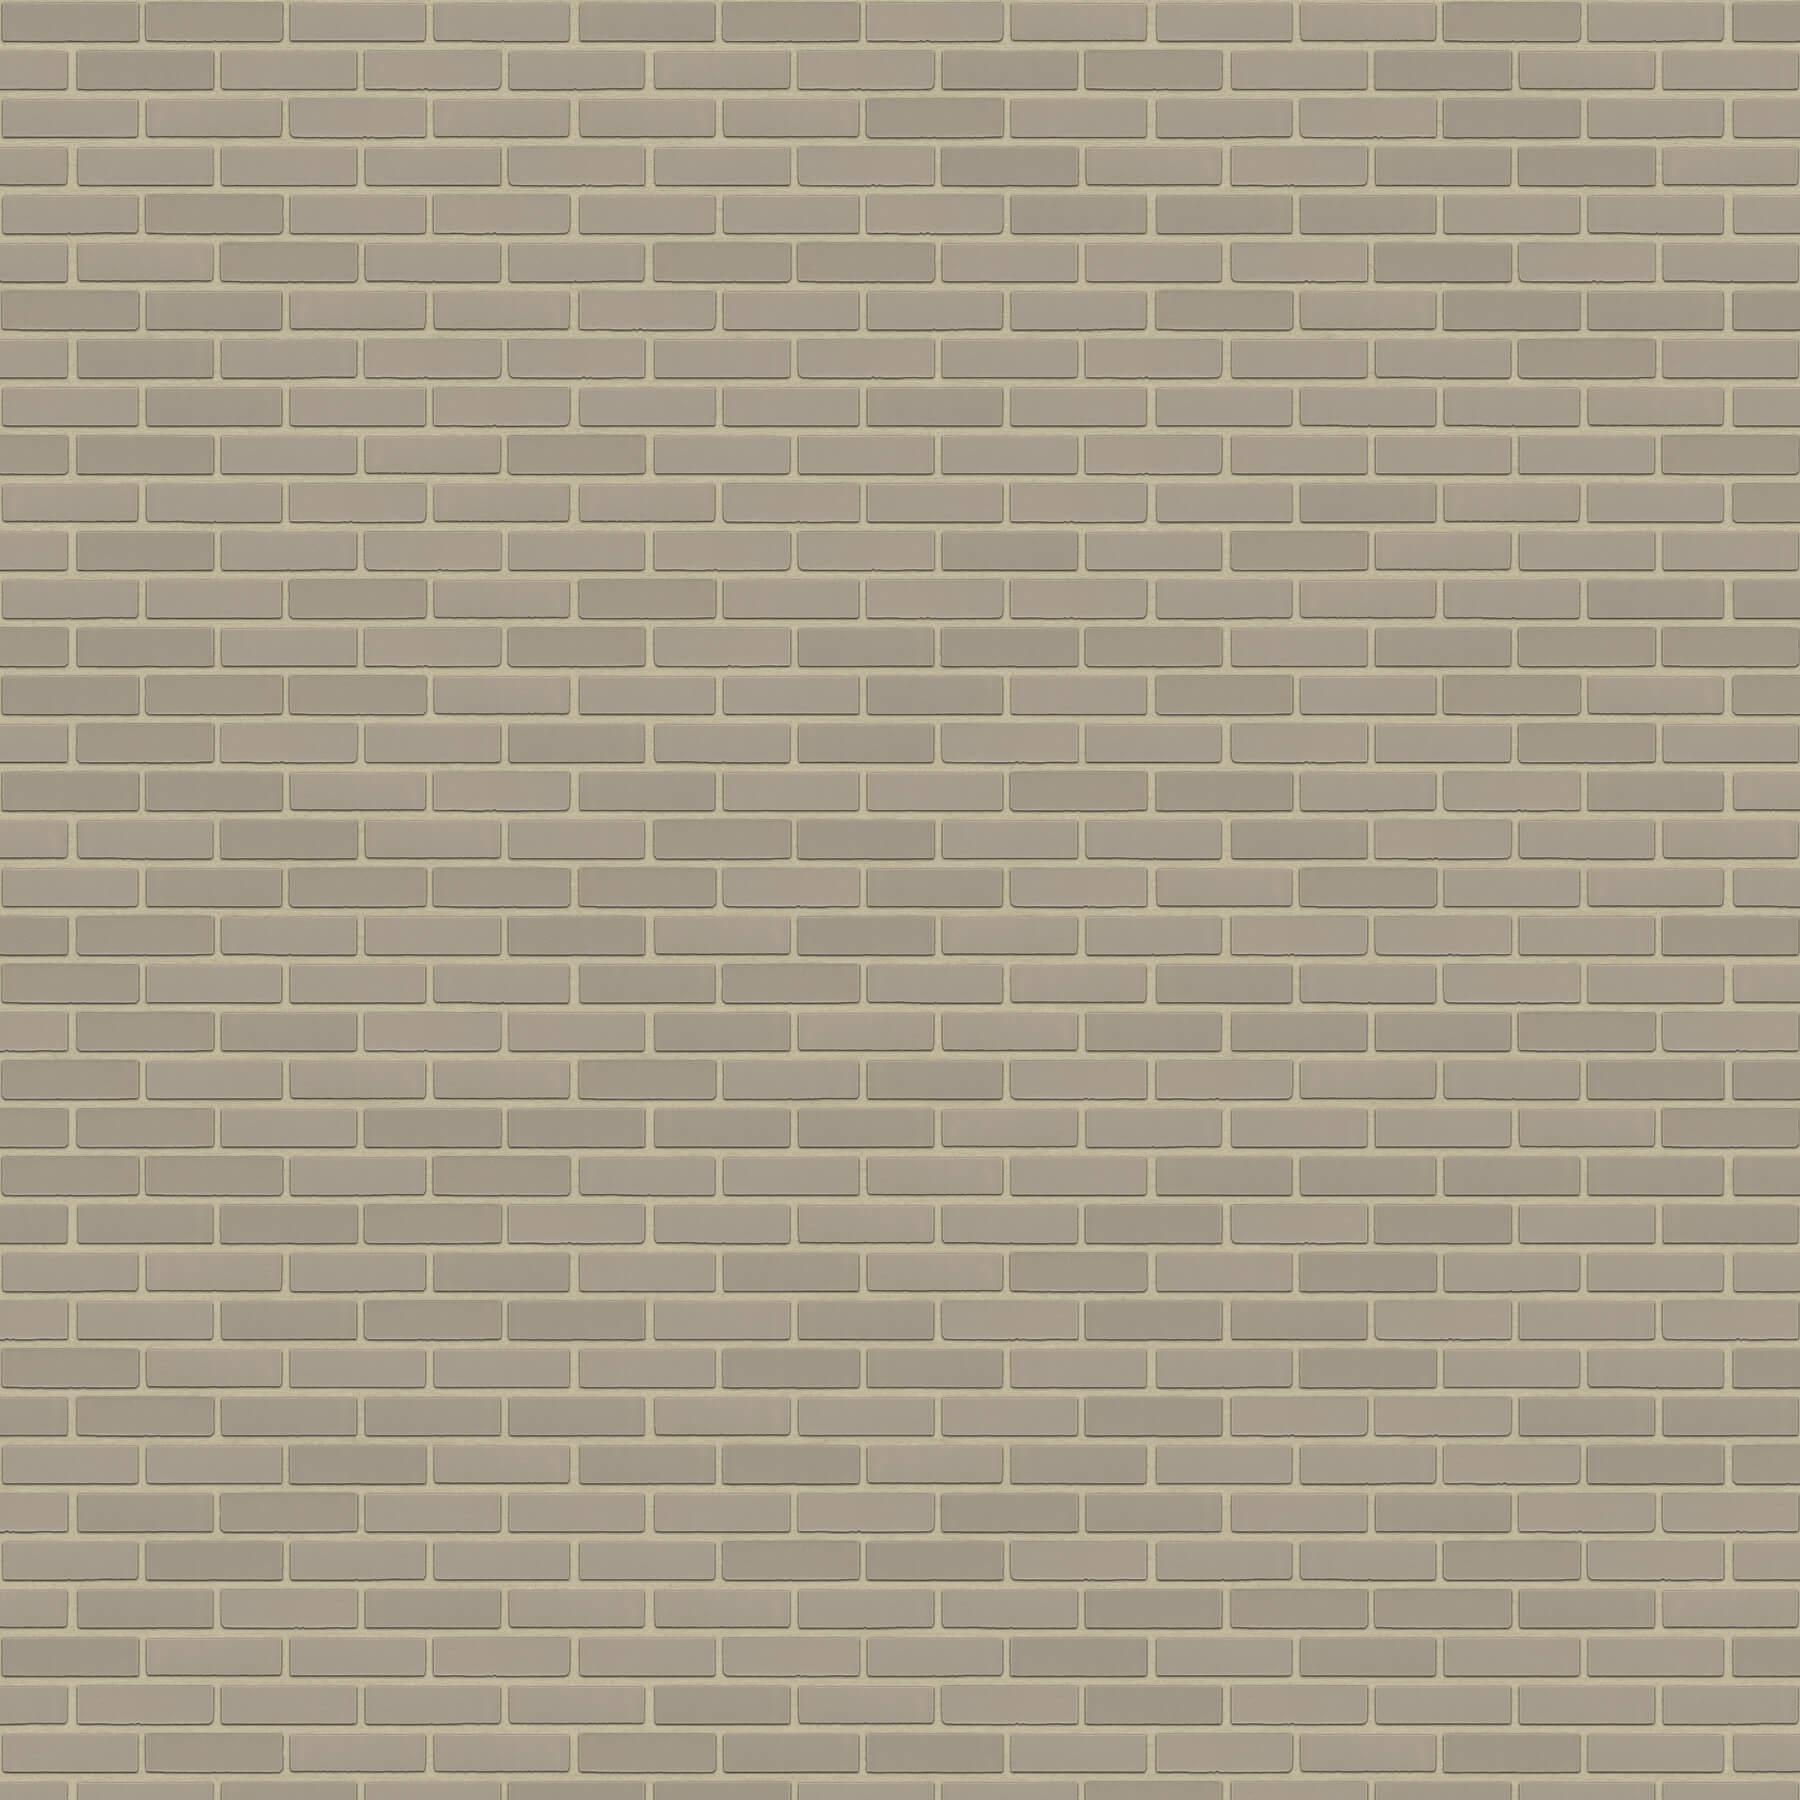 Dekorativna cigla listela FeldHaus Klinker r-800 nf Bez Fuga